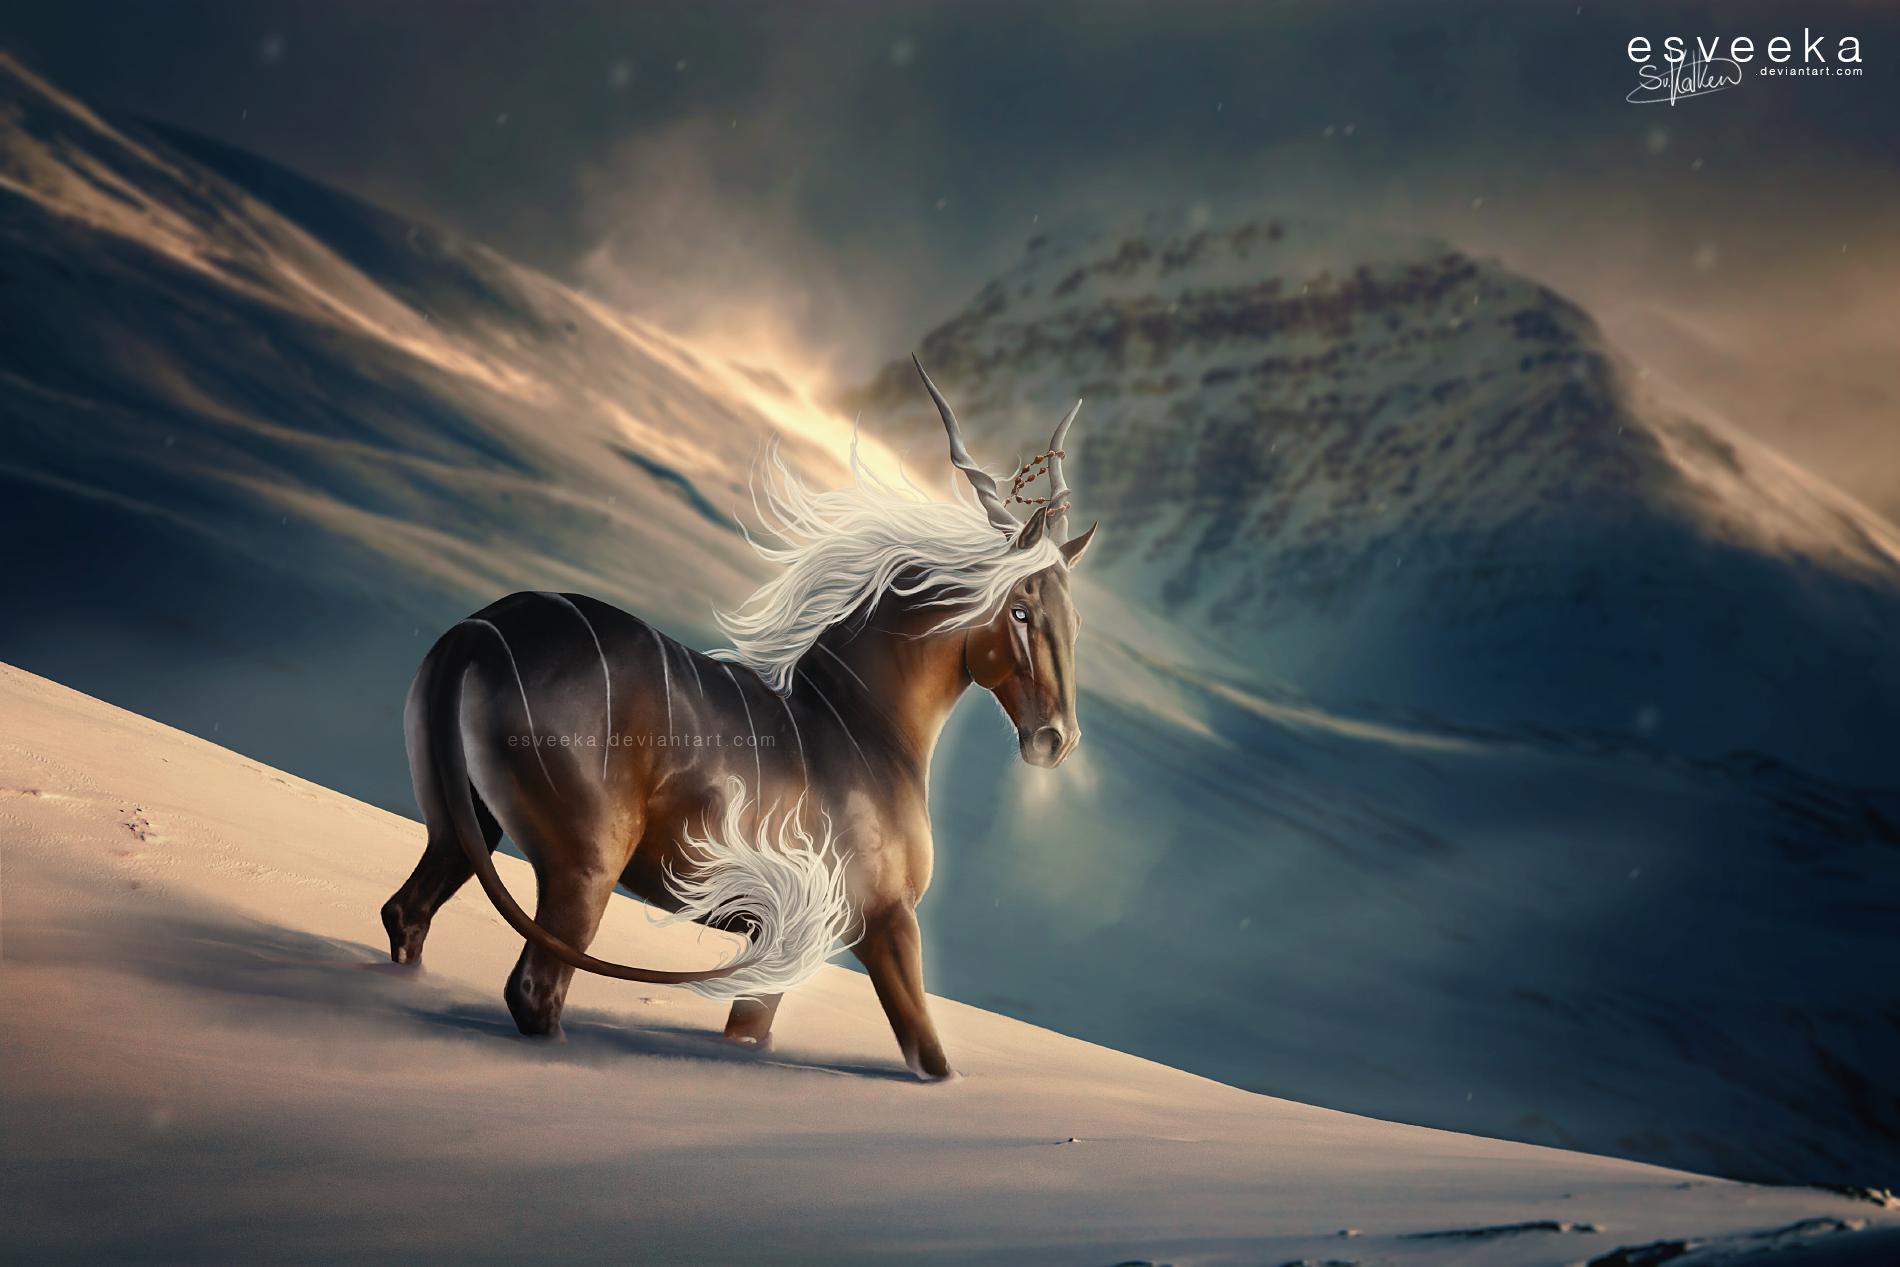 Wonderful Wallpaper Horse Deviantart - 9bbdbfe9edb55f04959934f582eda5e9  Snapshot_934240.png